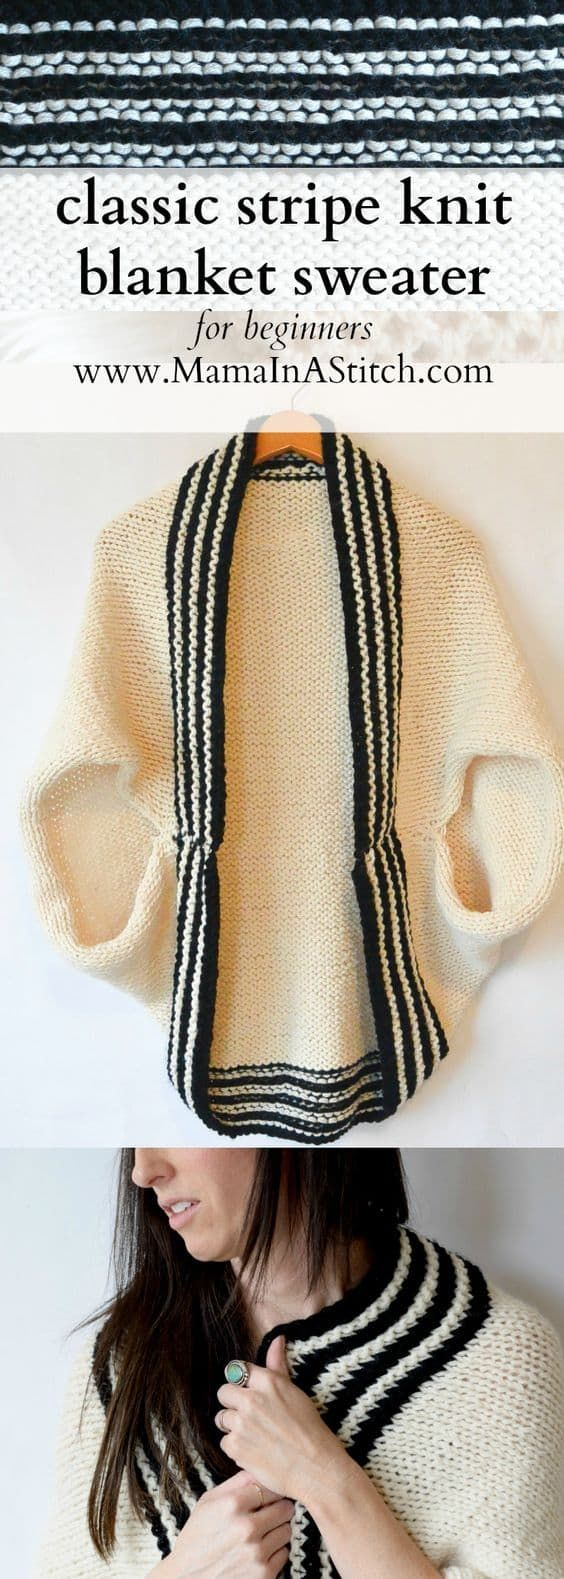 Cocoon Shrug Knitting Pattern Free Tutorial Super Easy | Shrug ...